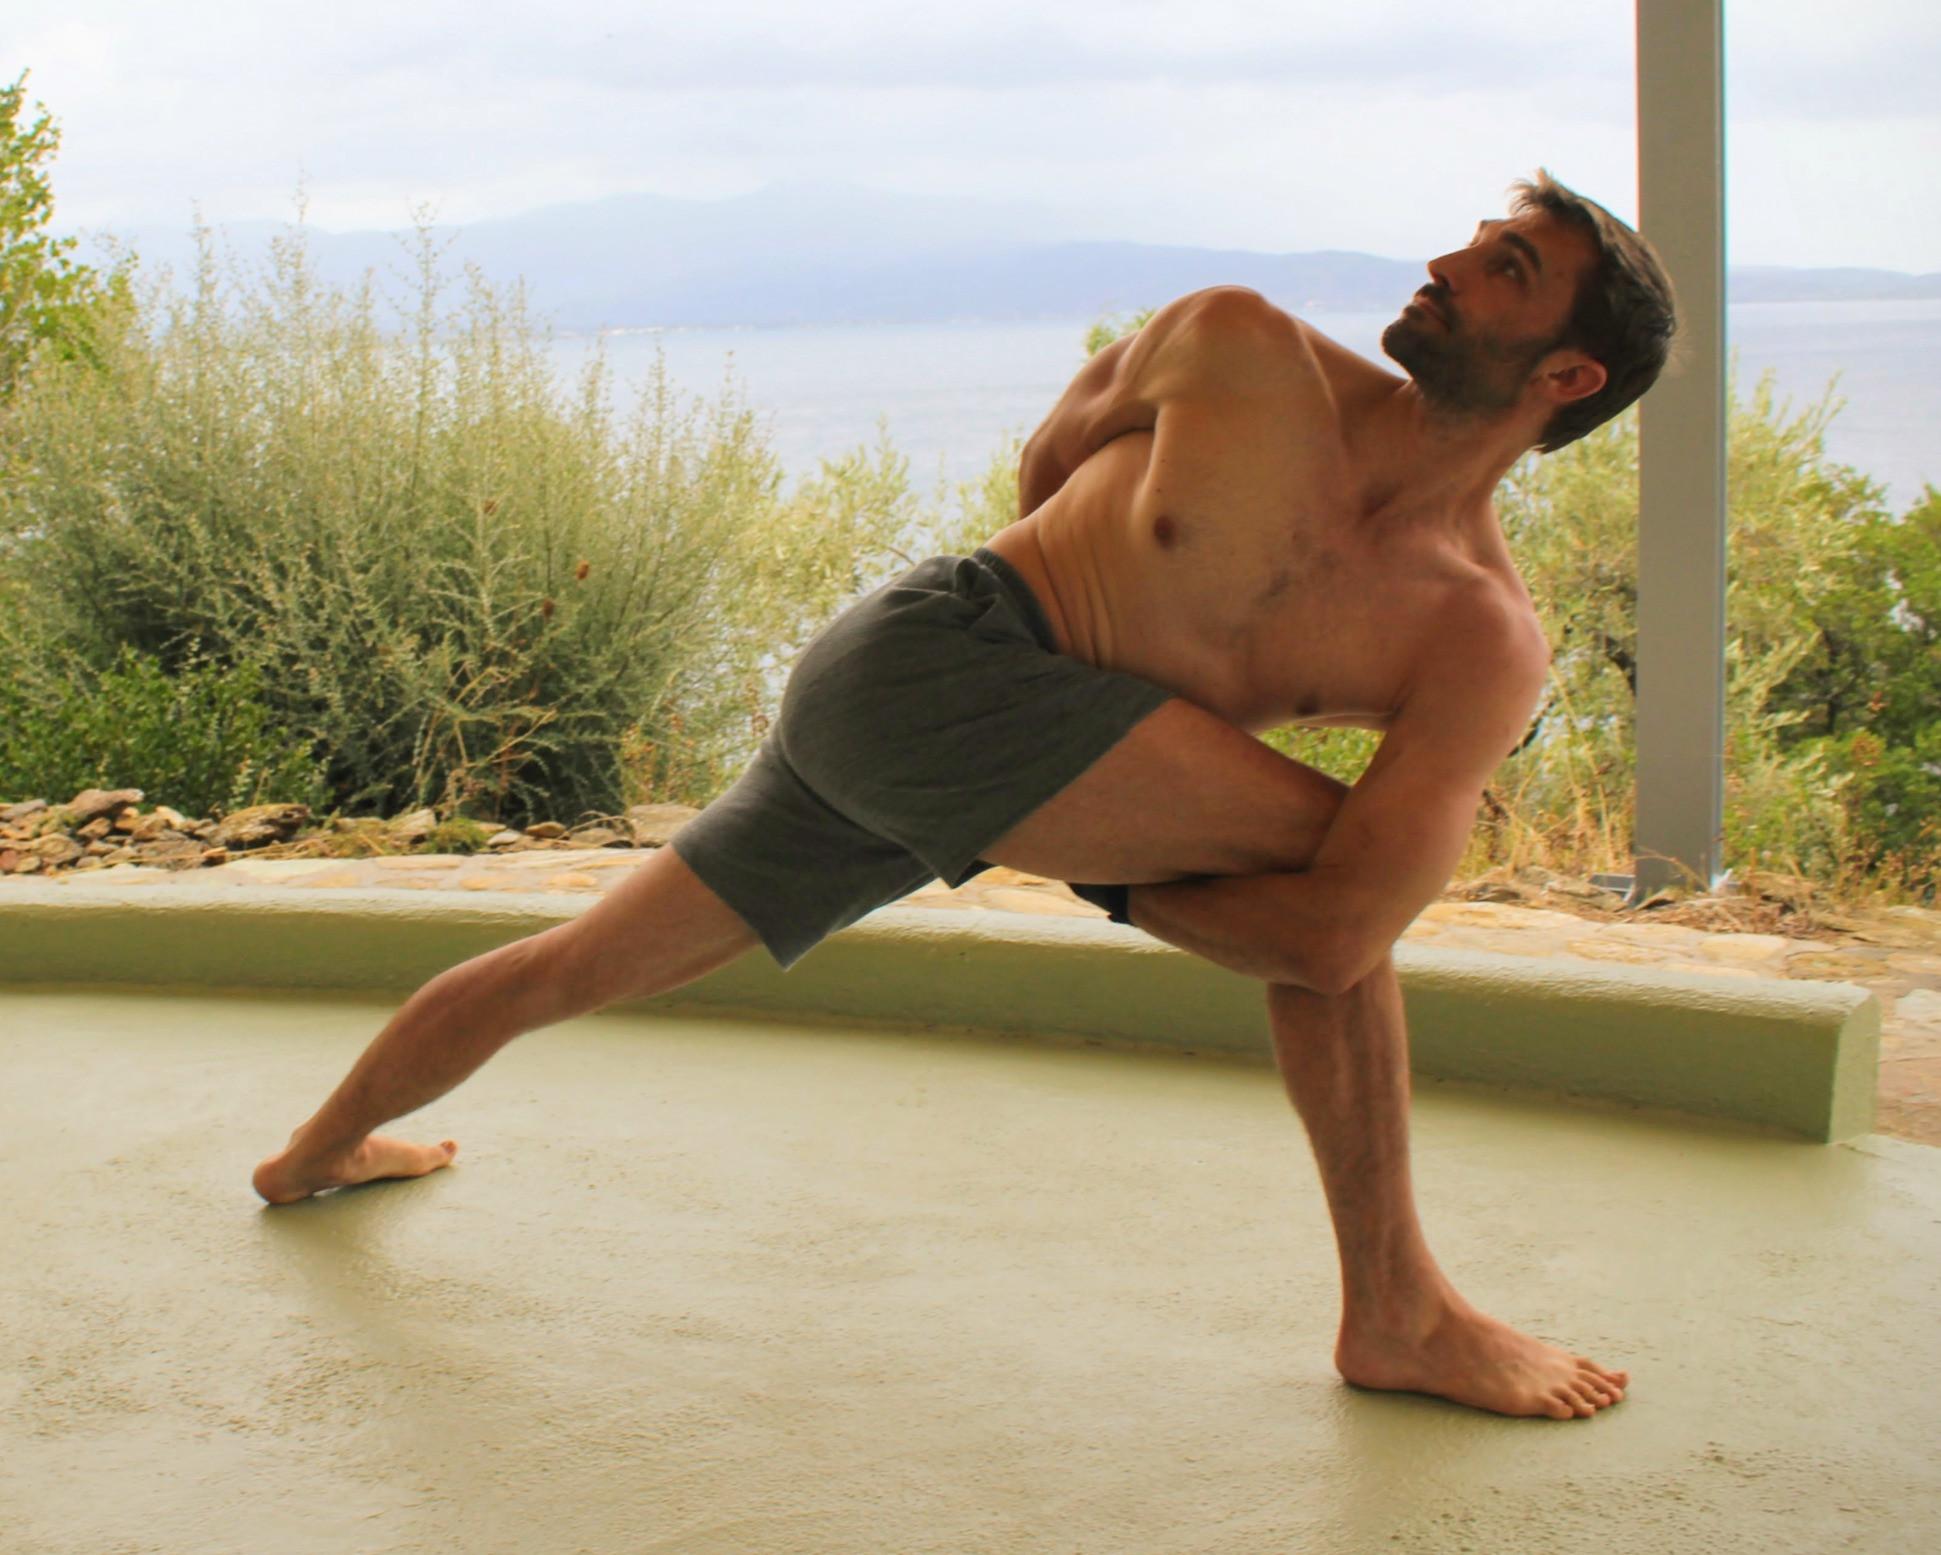 Pilates-Based Movement - Matt